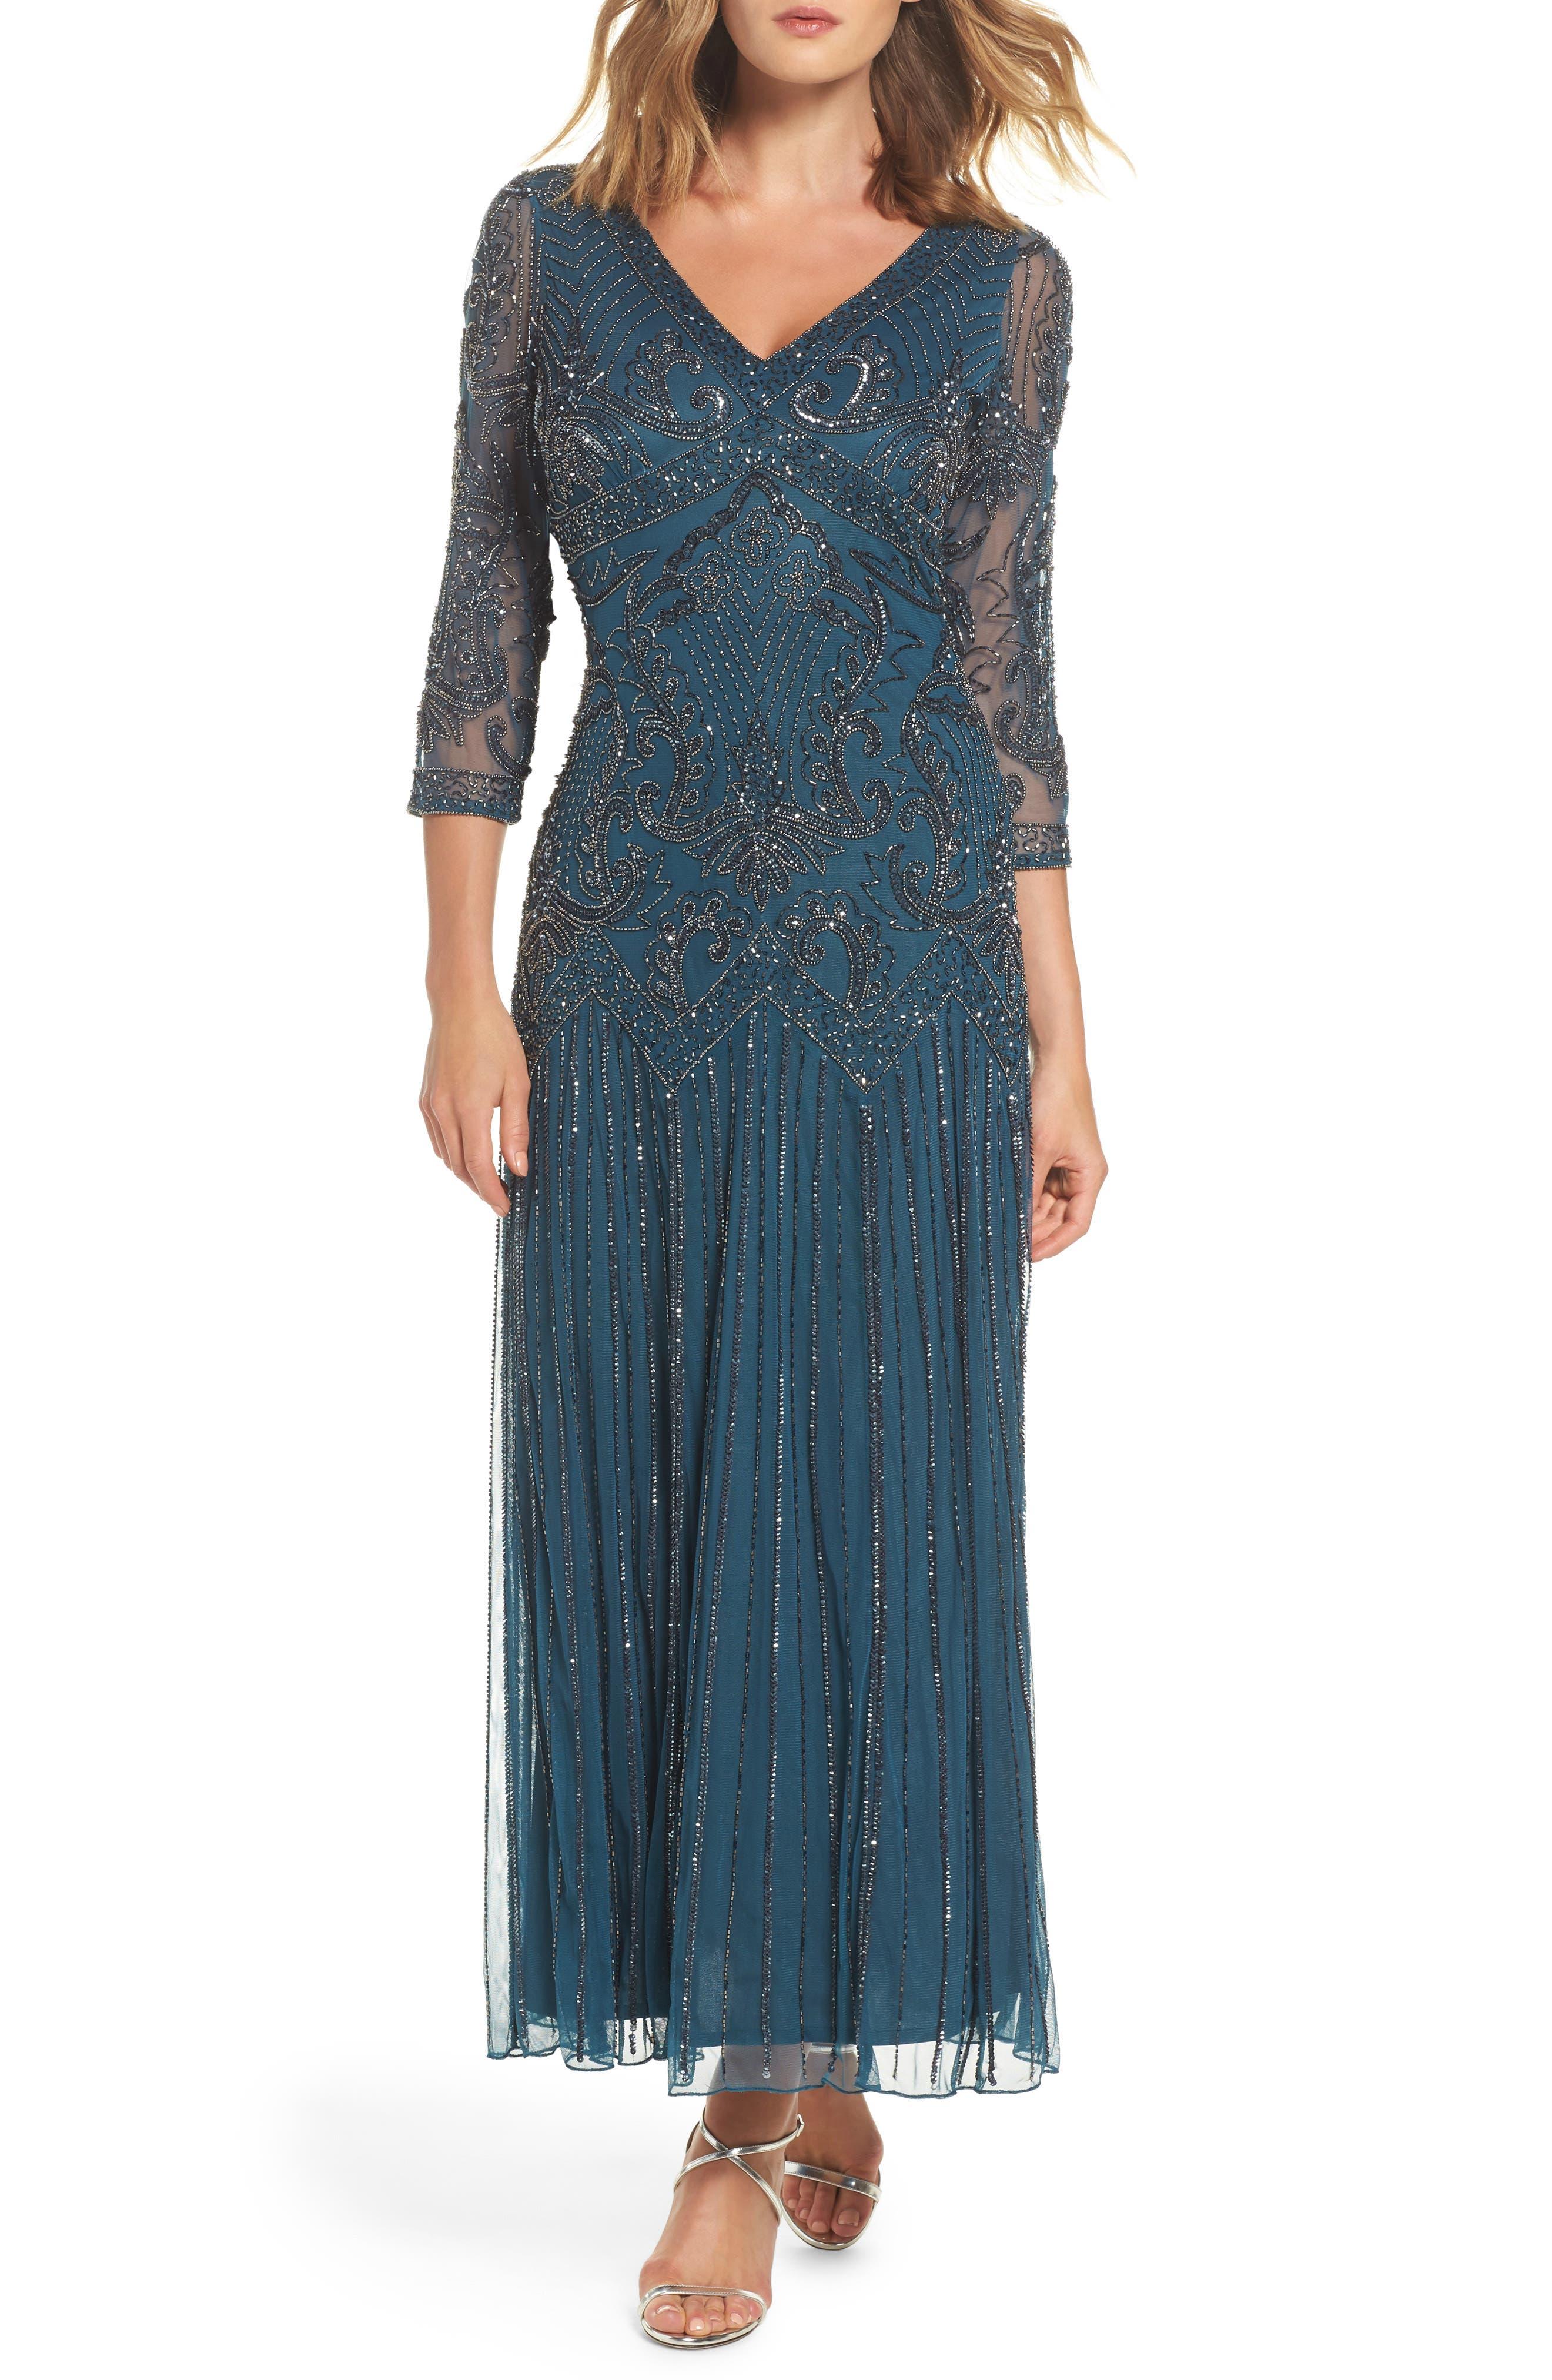 Main Image - Pisarro Nights Embellished Mesh Drop Waist Dress (Regular & Petite)